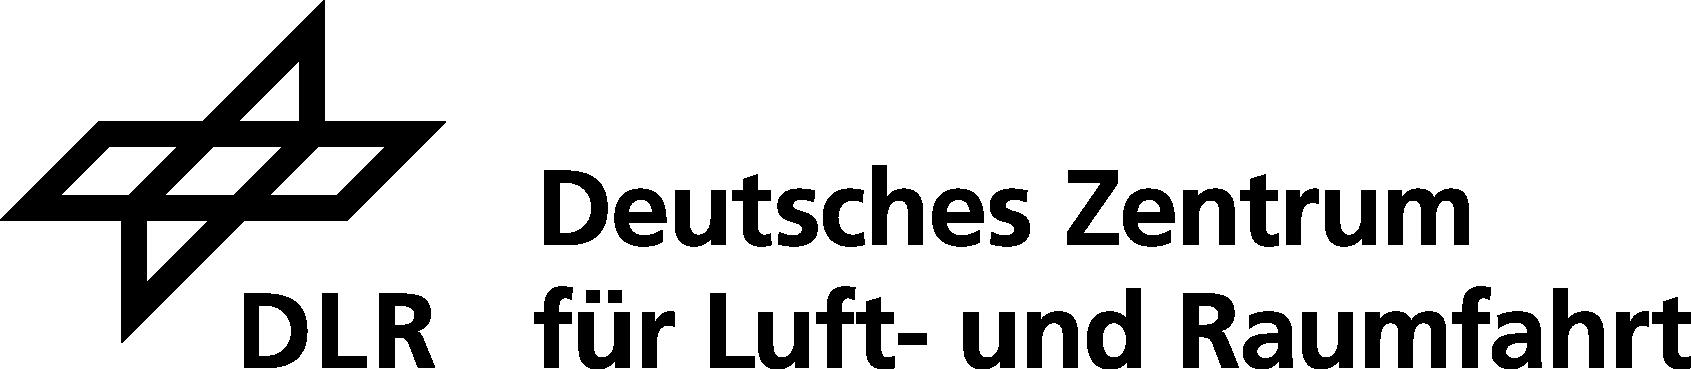 dlr_logo_schwarz